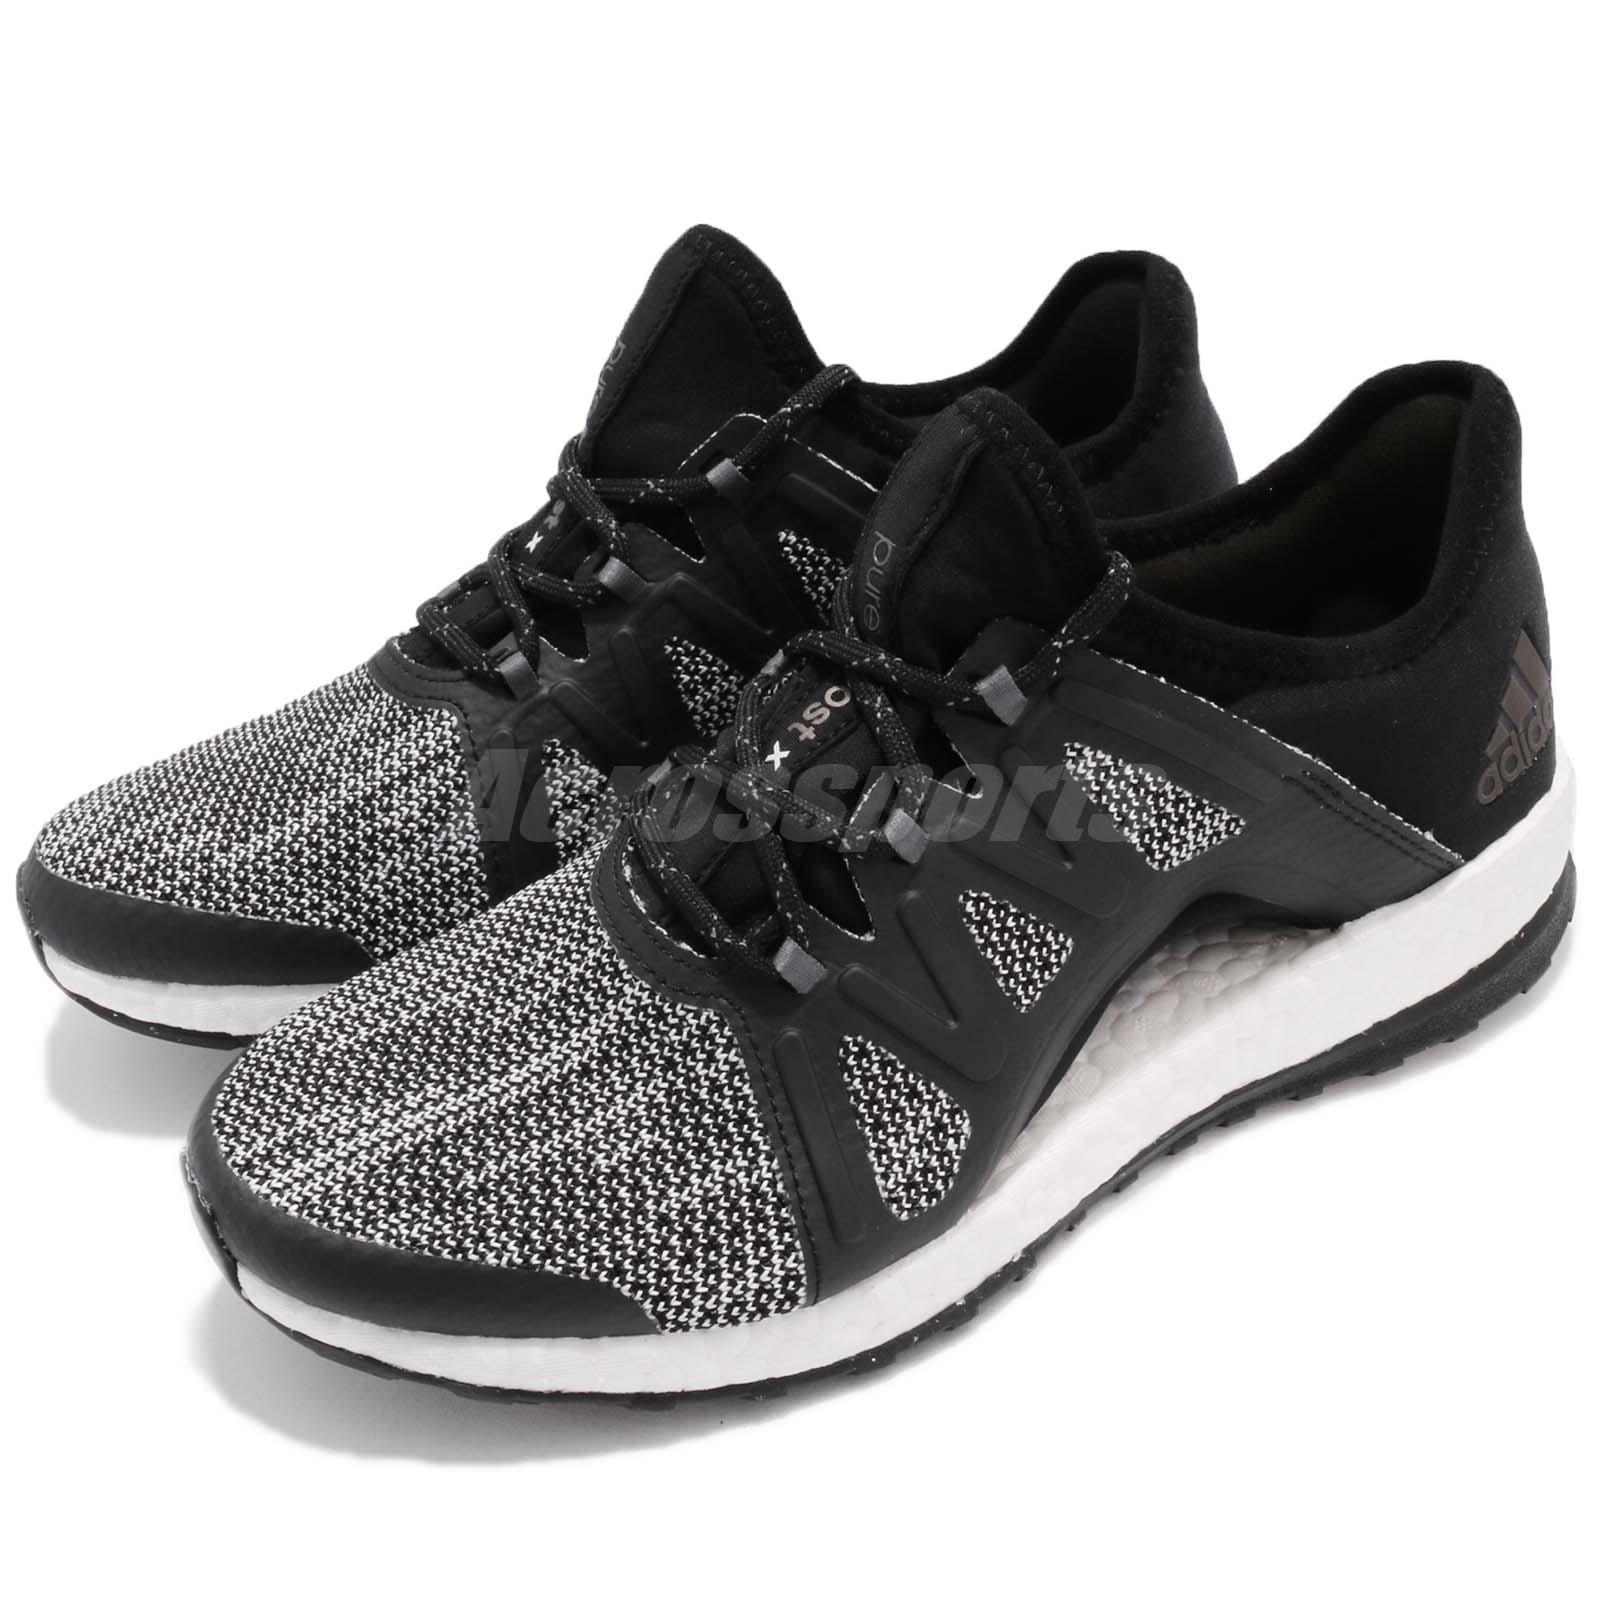 90757fa1871b1 Details about adidas PureBoost Xpose All Terrain ATR Black White Women Running  Shoes S81148